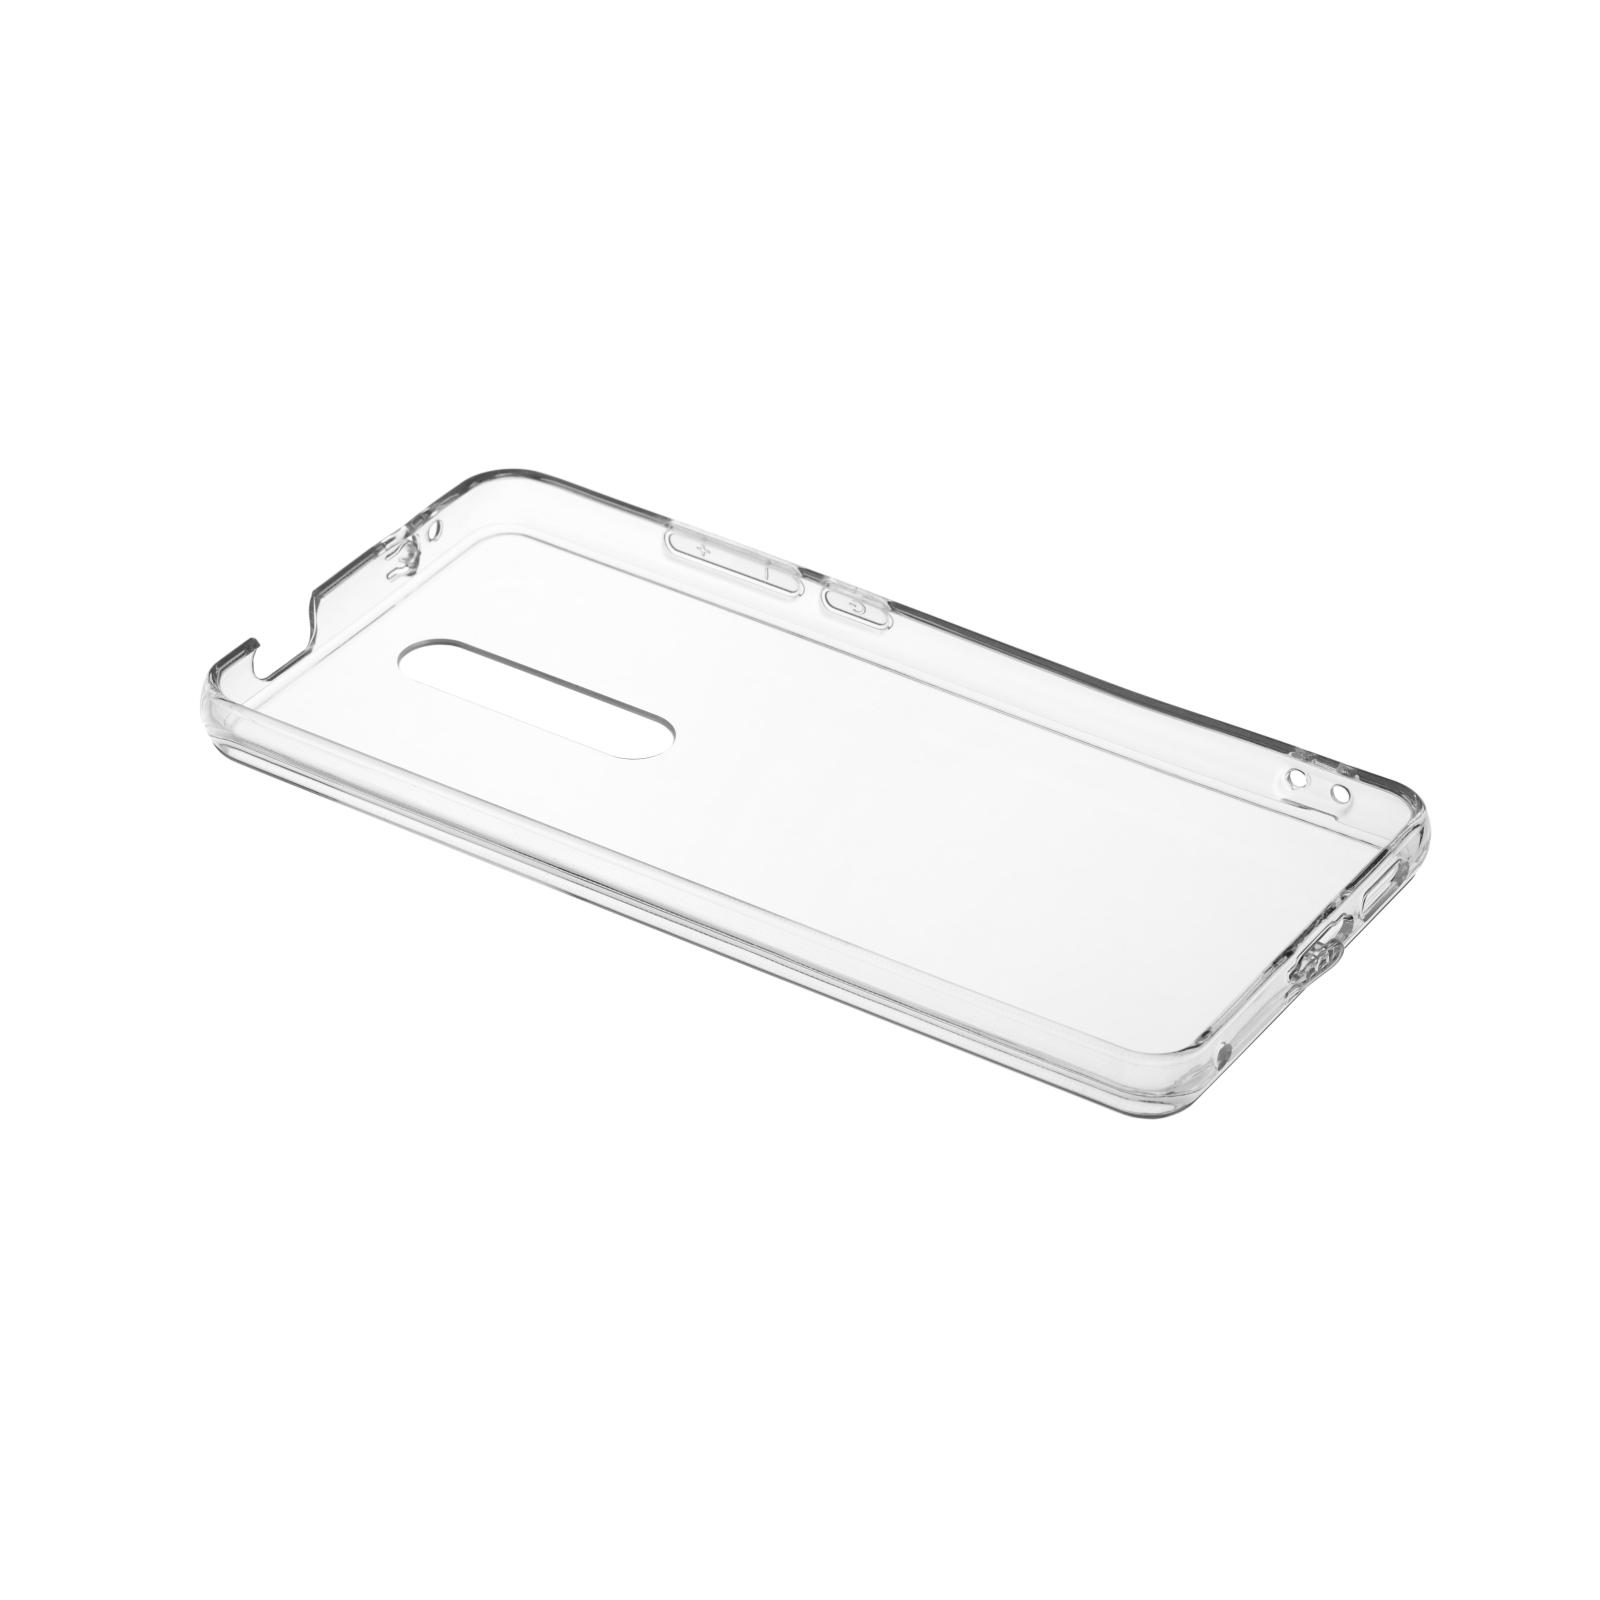 Чехол для моб. телефона 2E Xiaomi Mi 9T/K20/K20 PRO, Hybrid, Transparent (2E-MI-MI9T-AOHB-TR) изображение 2